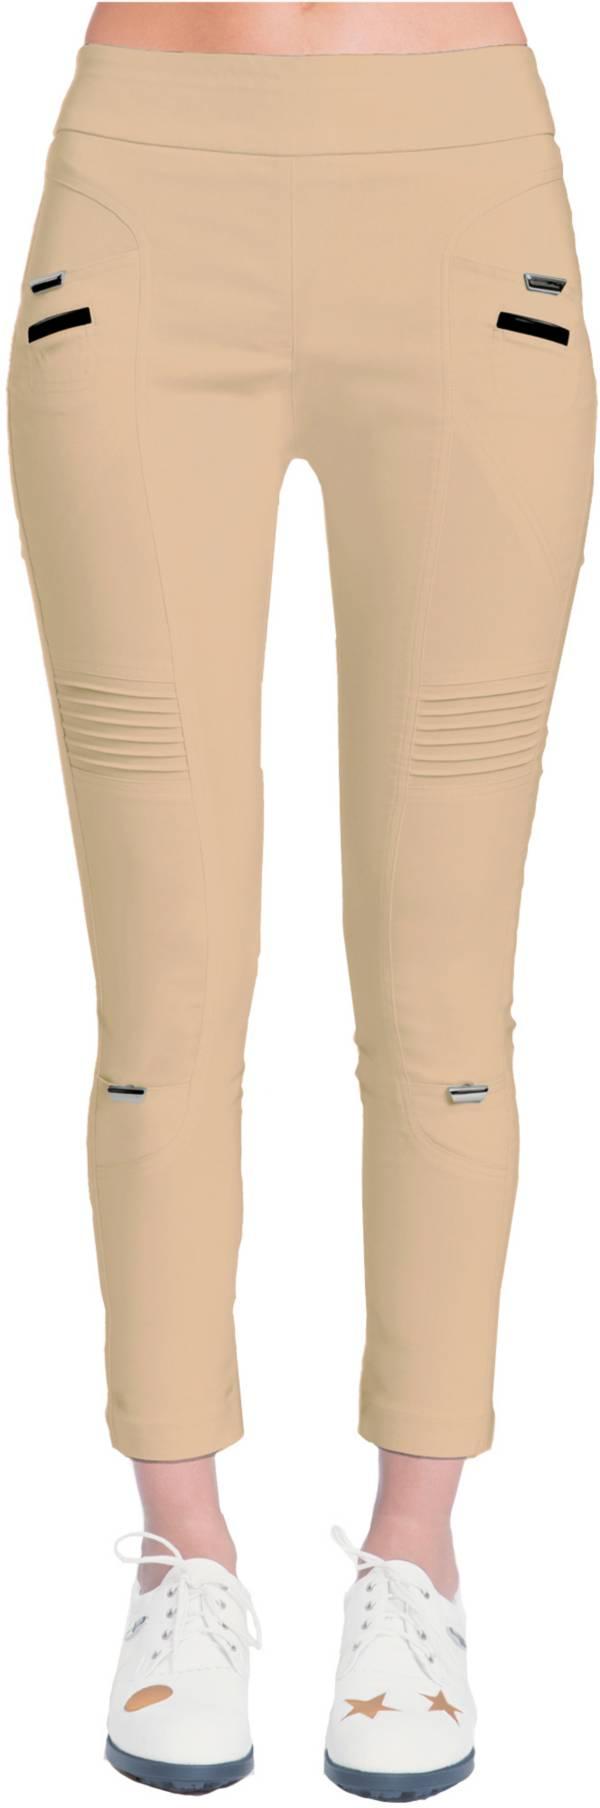 "Jamie Sadock Women's 38.5"" Skinnylicious Ankle Golf Pant product image"